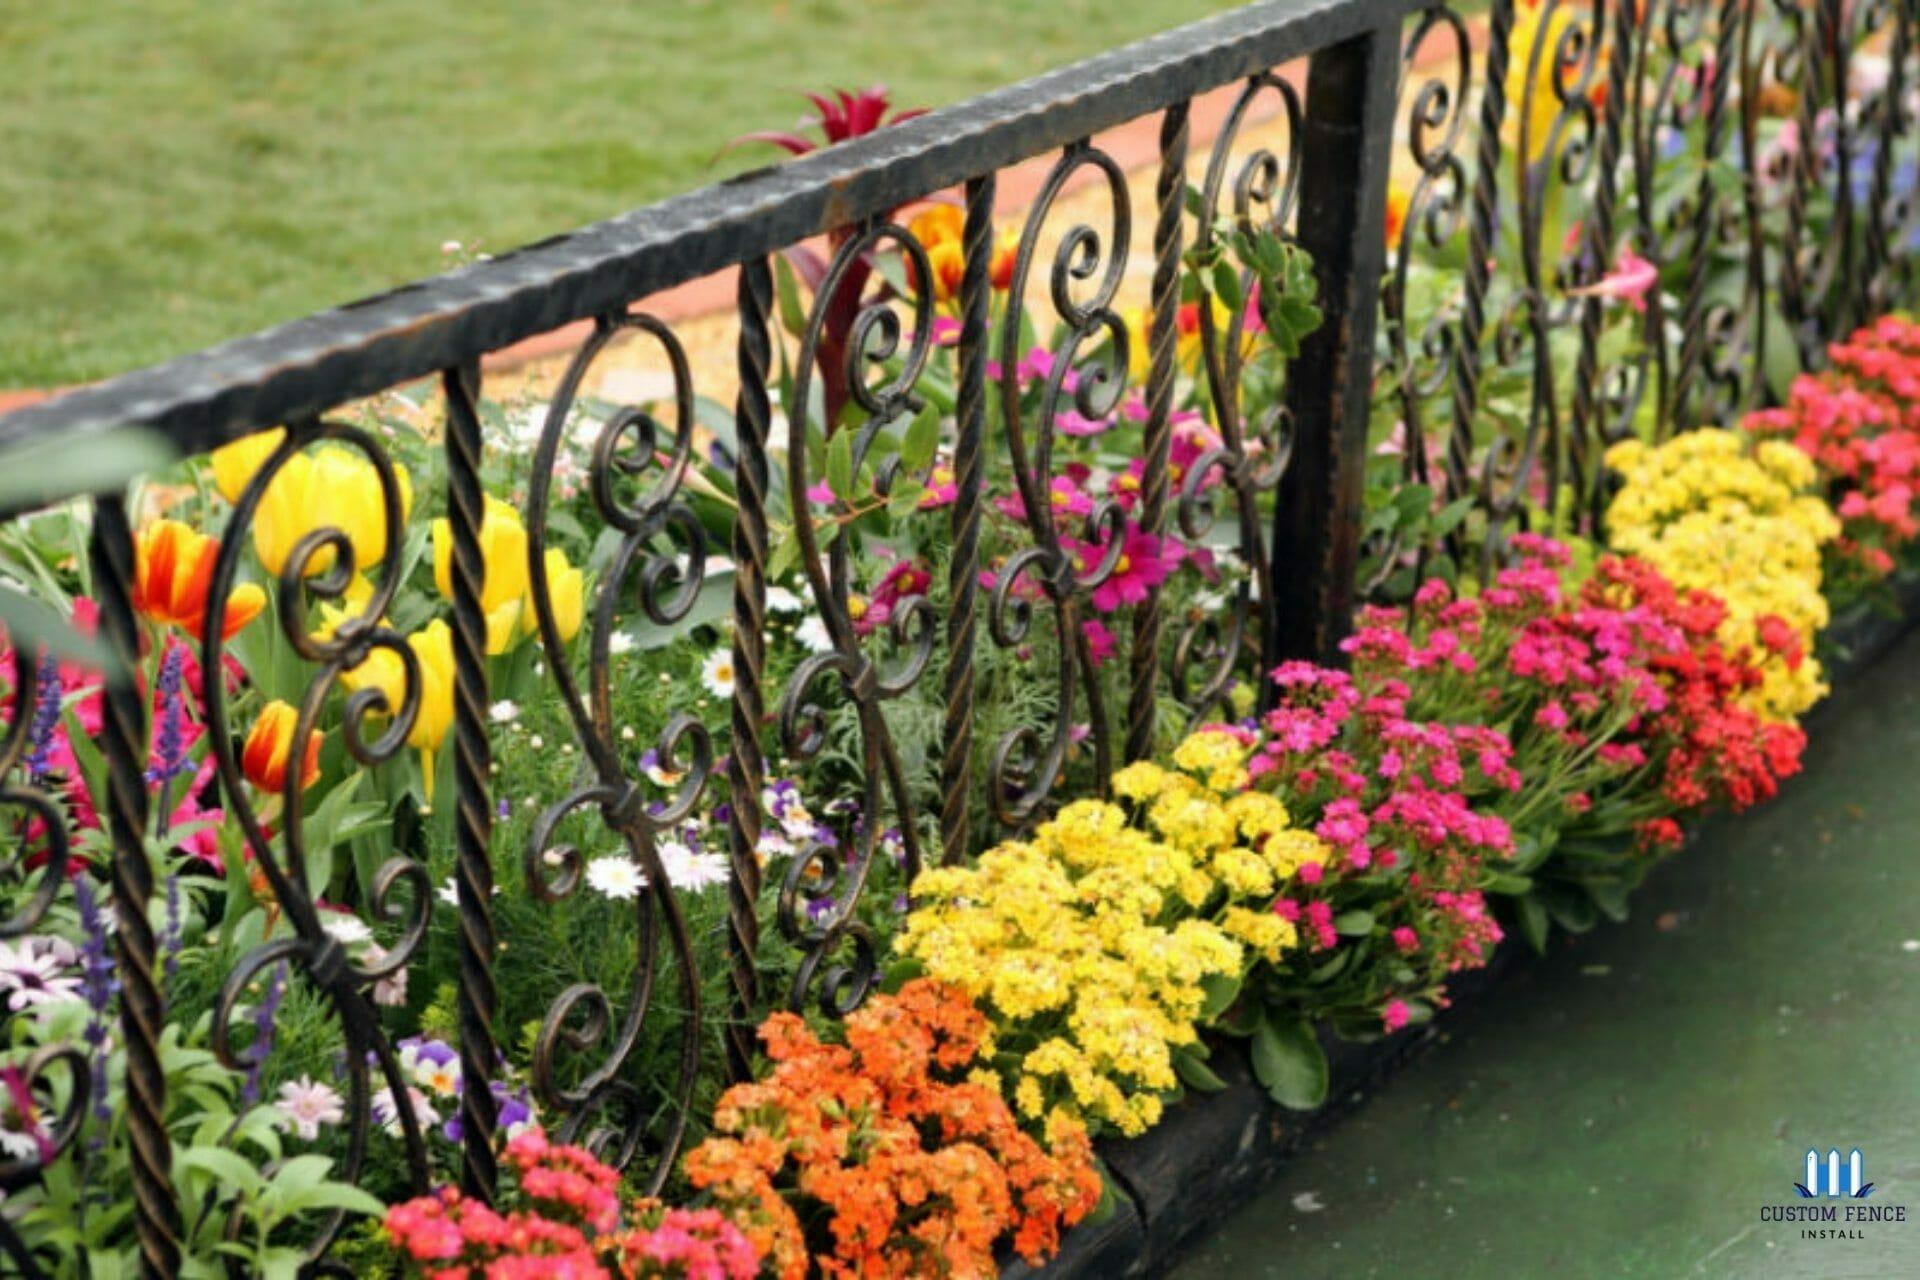 flowers-ornamental-iron-fencing-wa